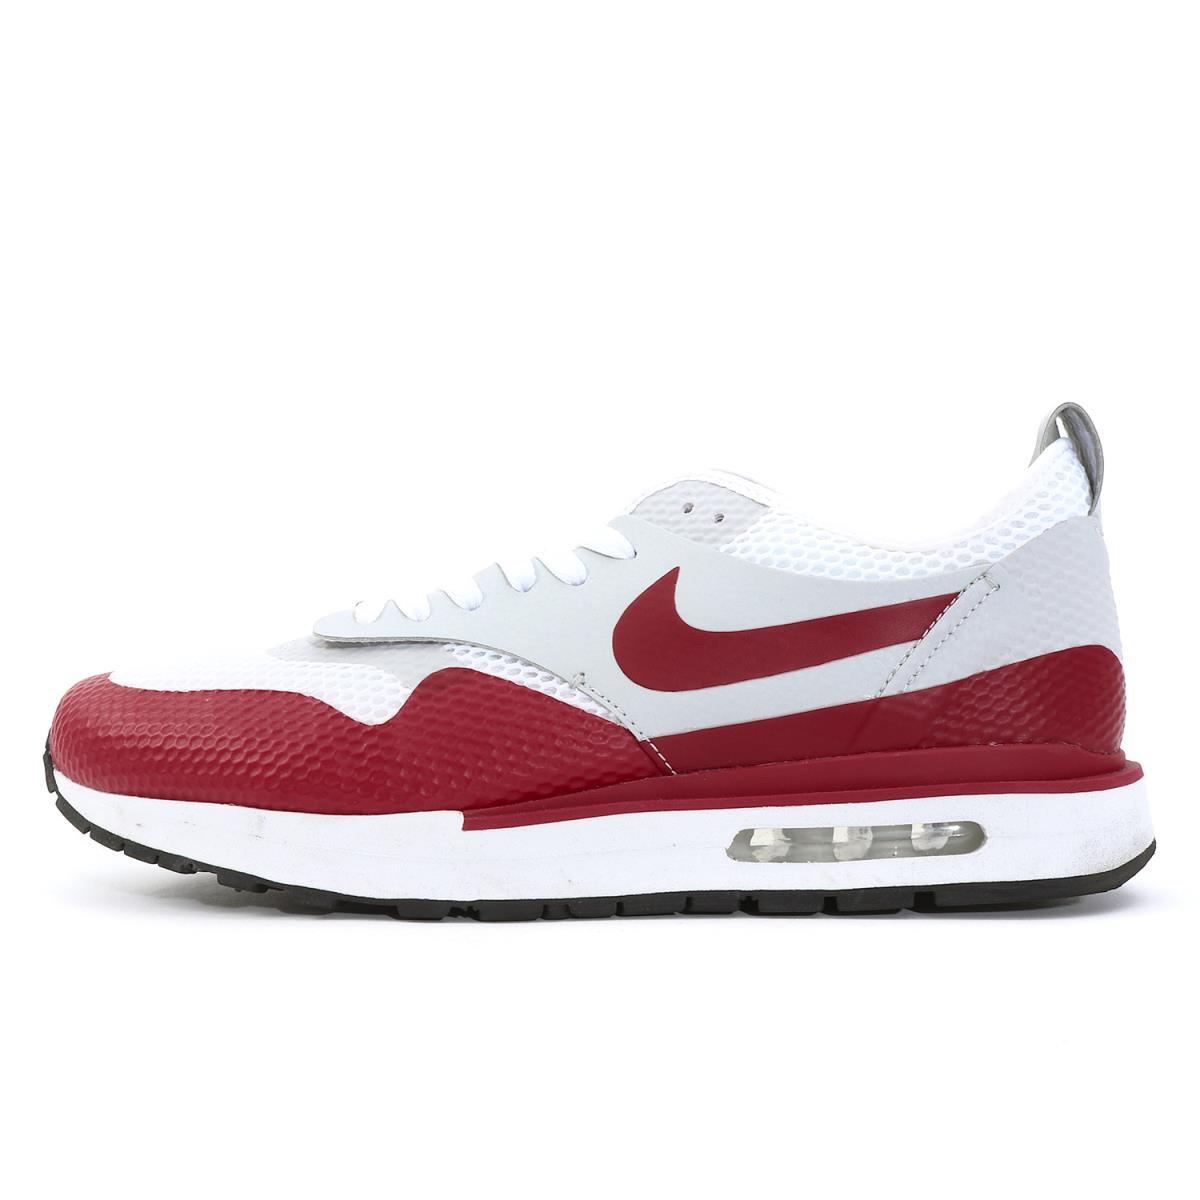 NIKE (Nike) AIR MAX 1 ROYAL SE SP (AA0869 100) white X gym red US10(28cm)